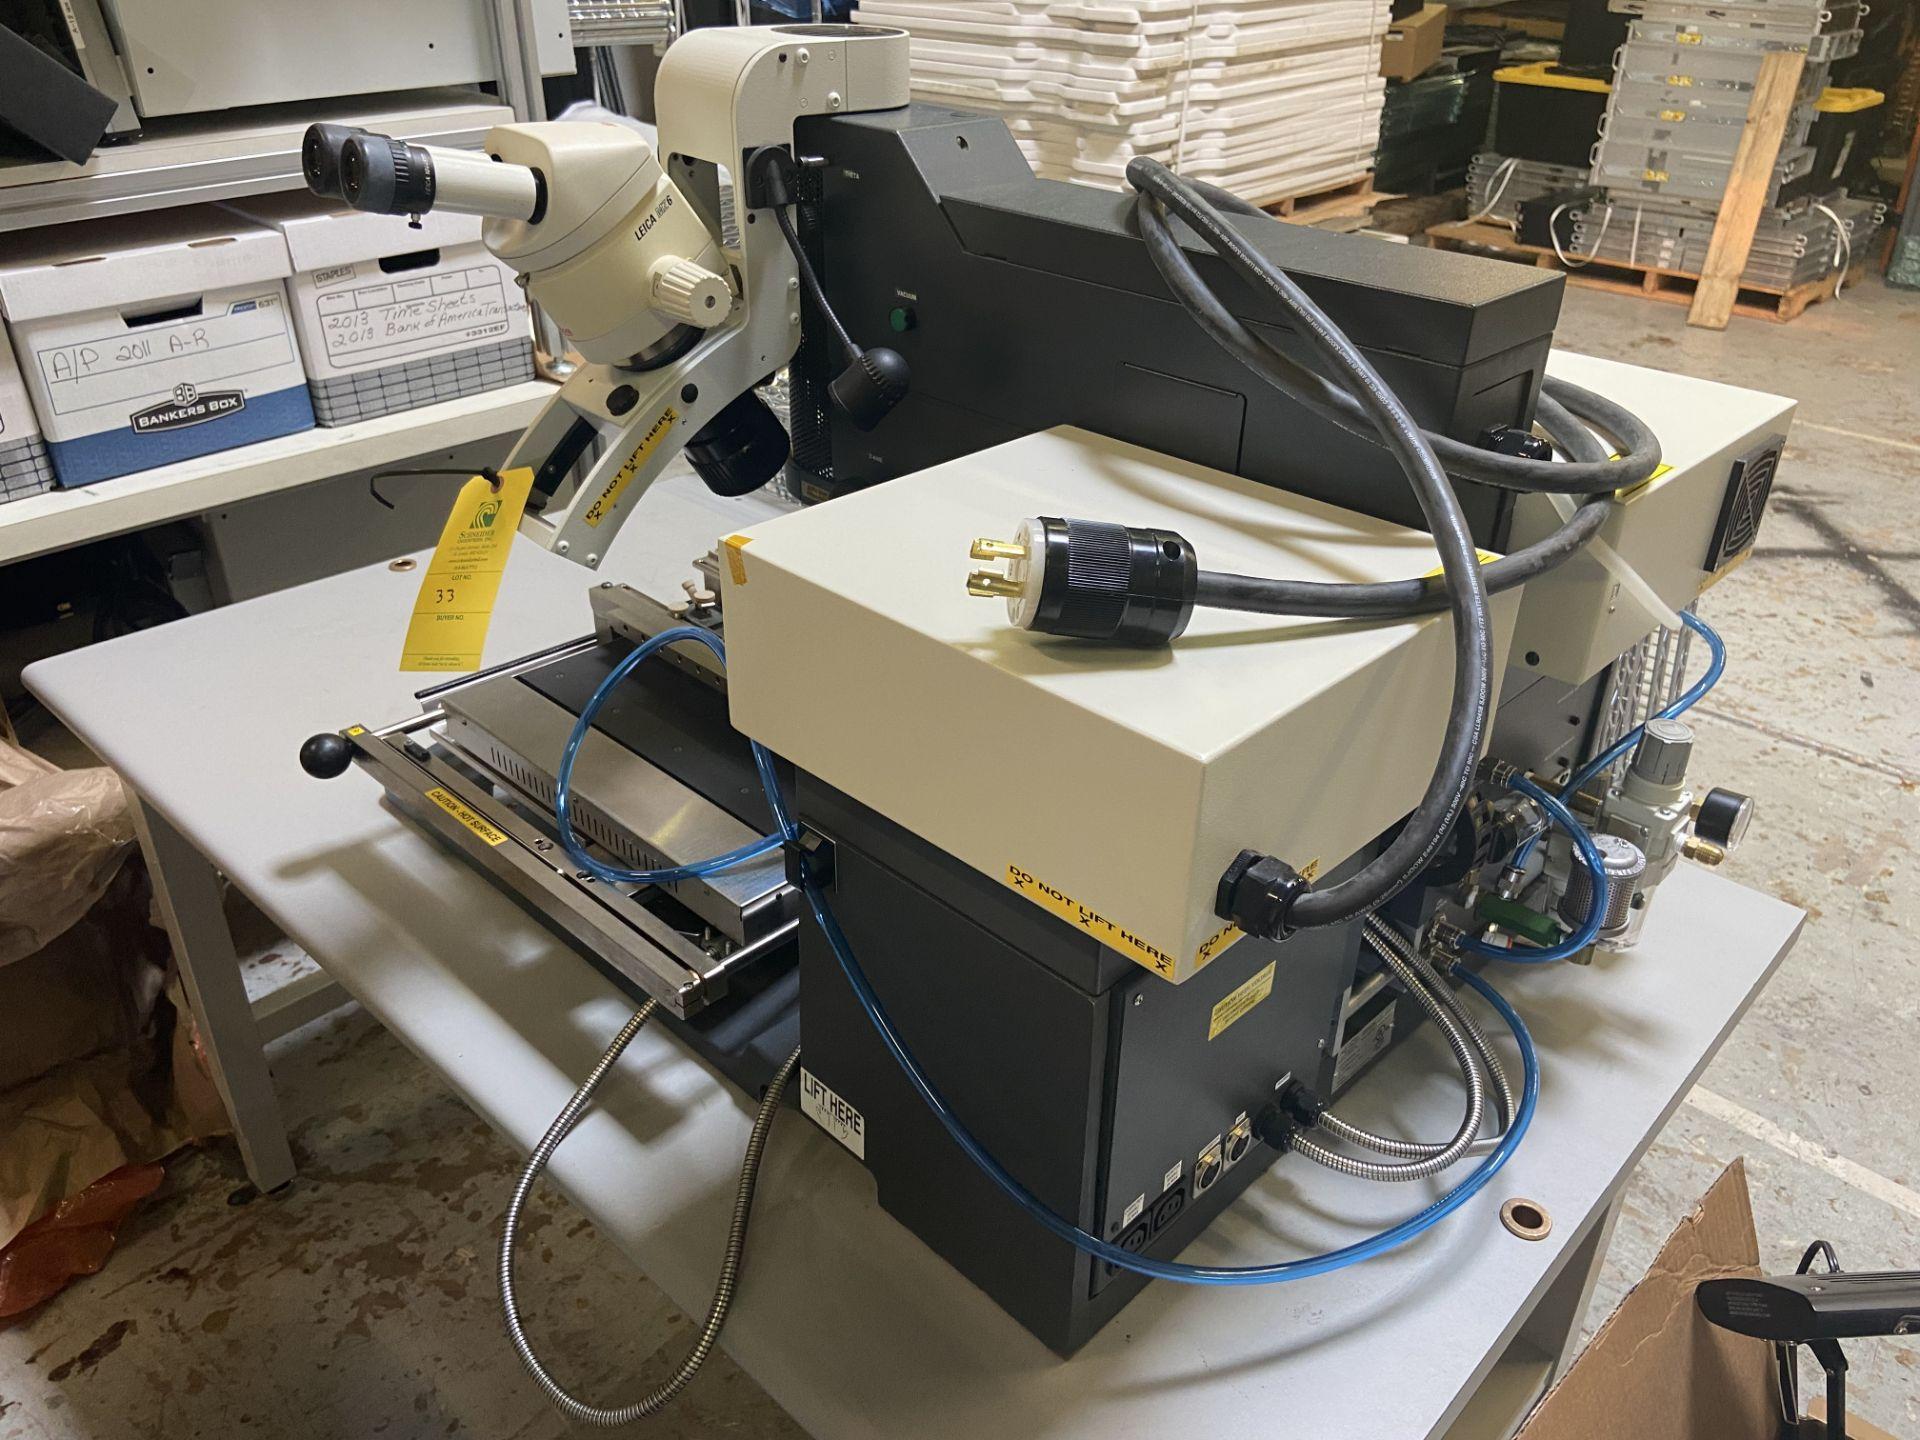 Air-Vac Rework Station, Model# DRS25, Serial# 0519-U6175, 208/240V, 3 Phase, 20 Amps, 50/60 Hz, - Image 2 of 14